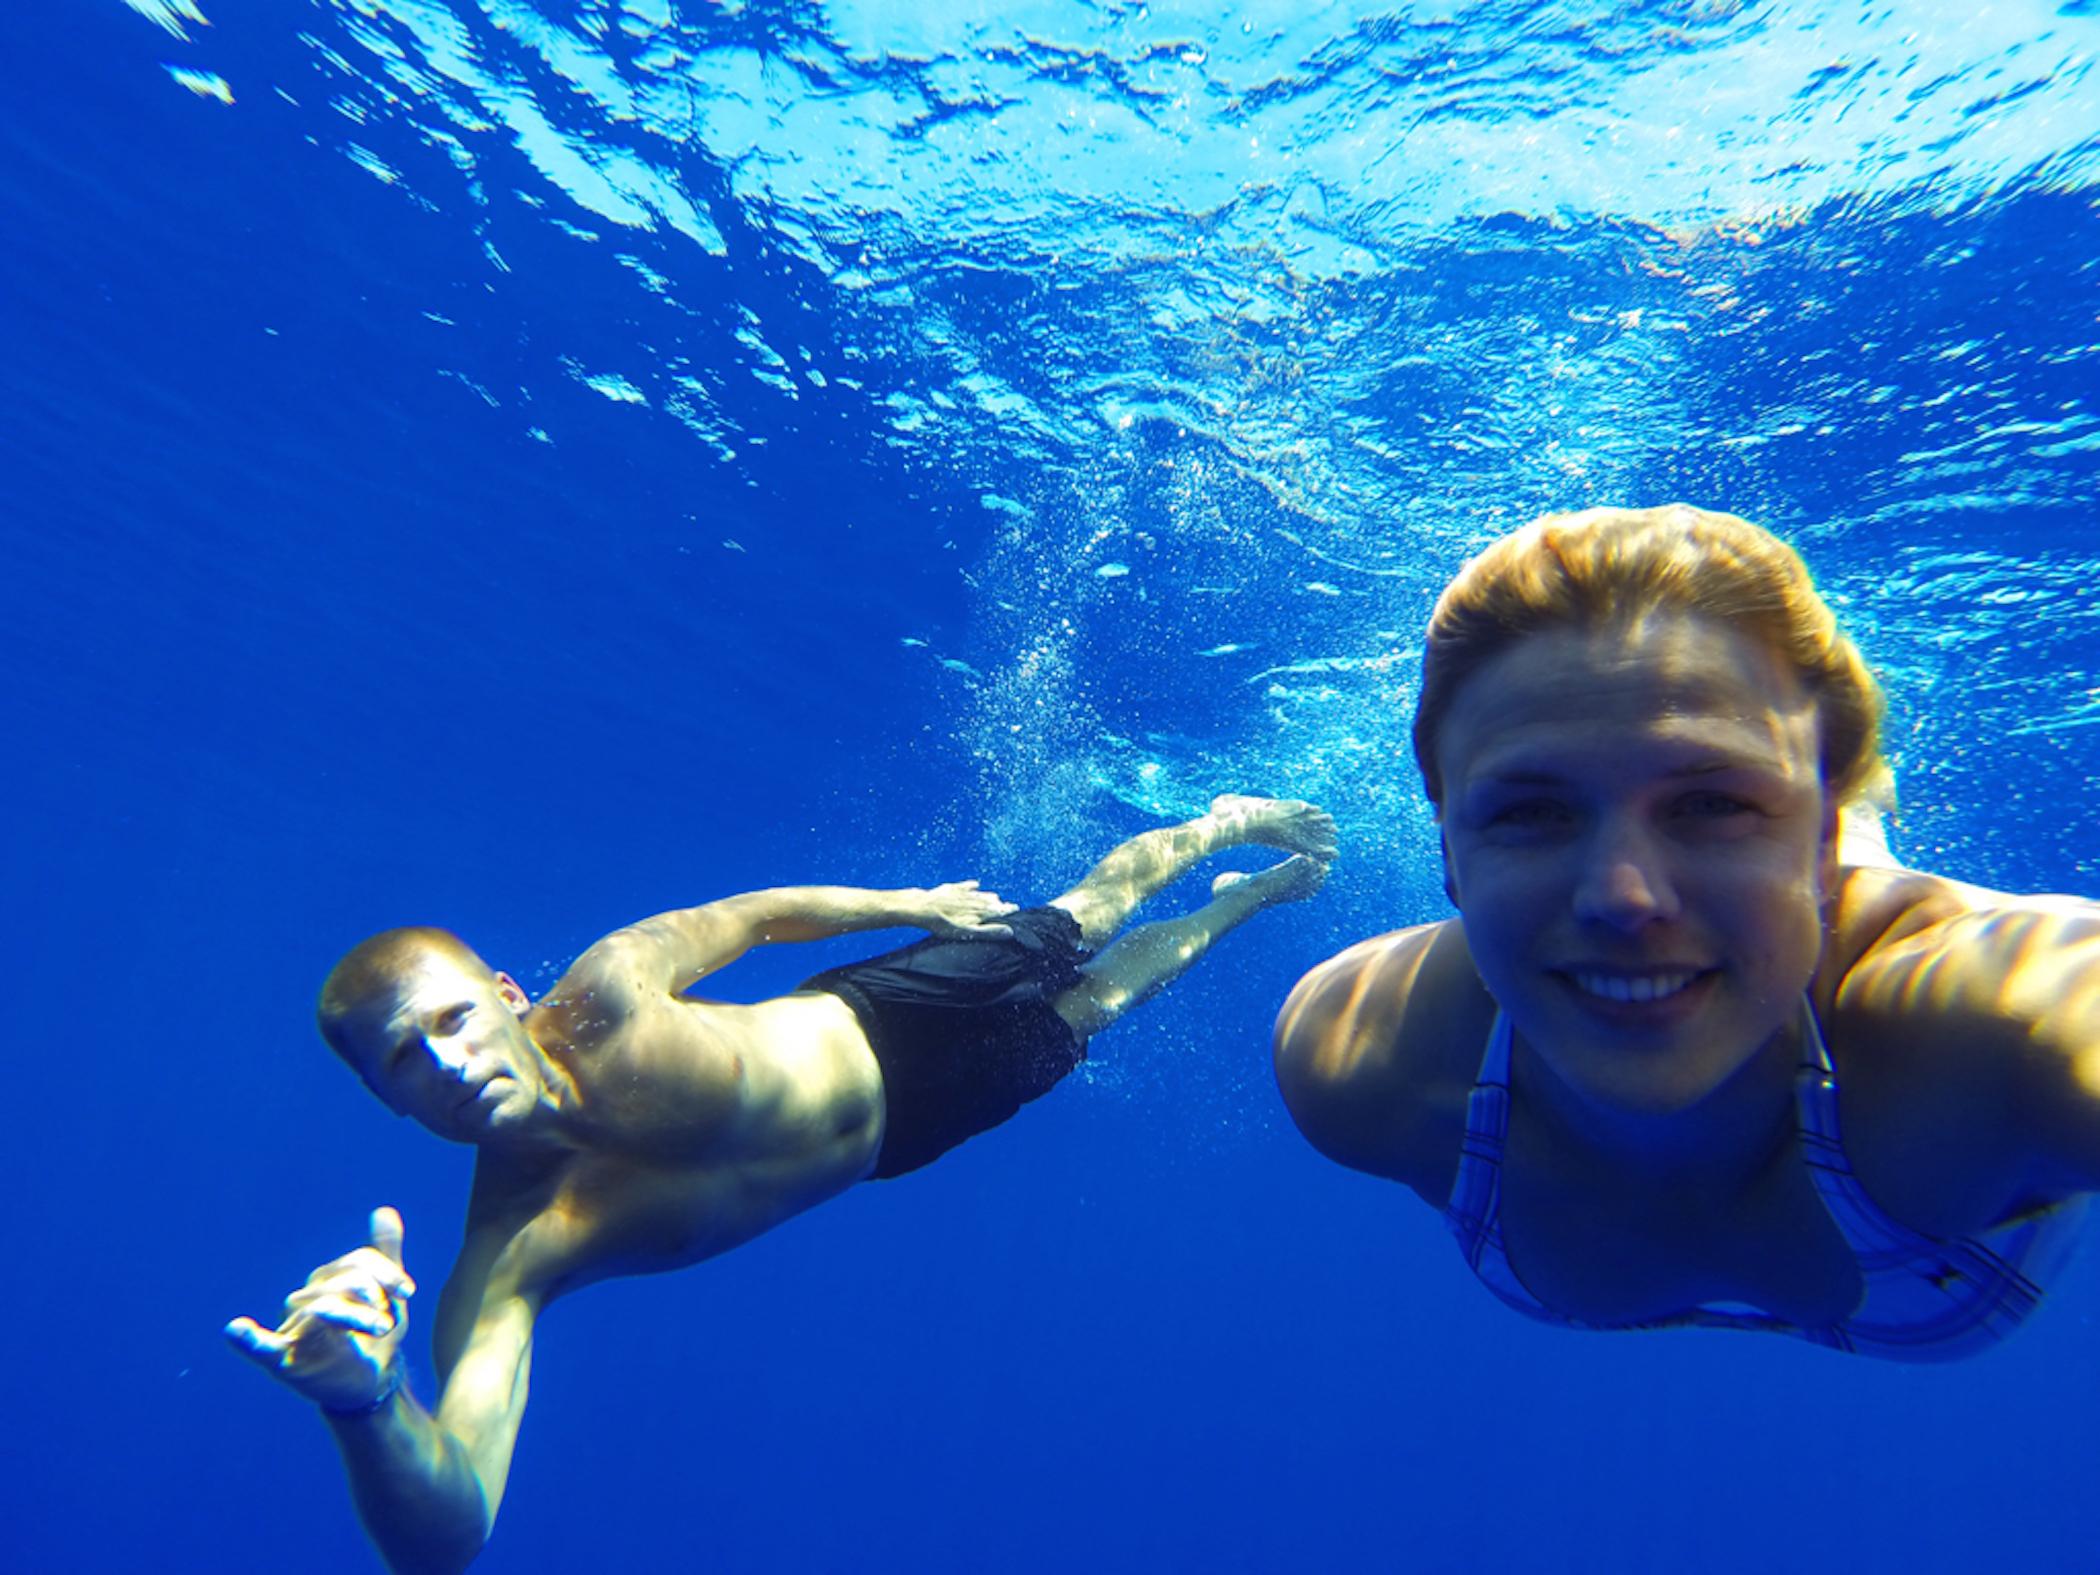 Deep ocean swimming on the way to Cuba!